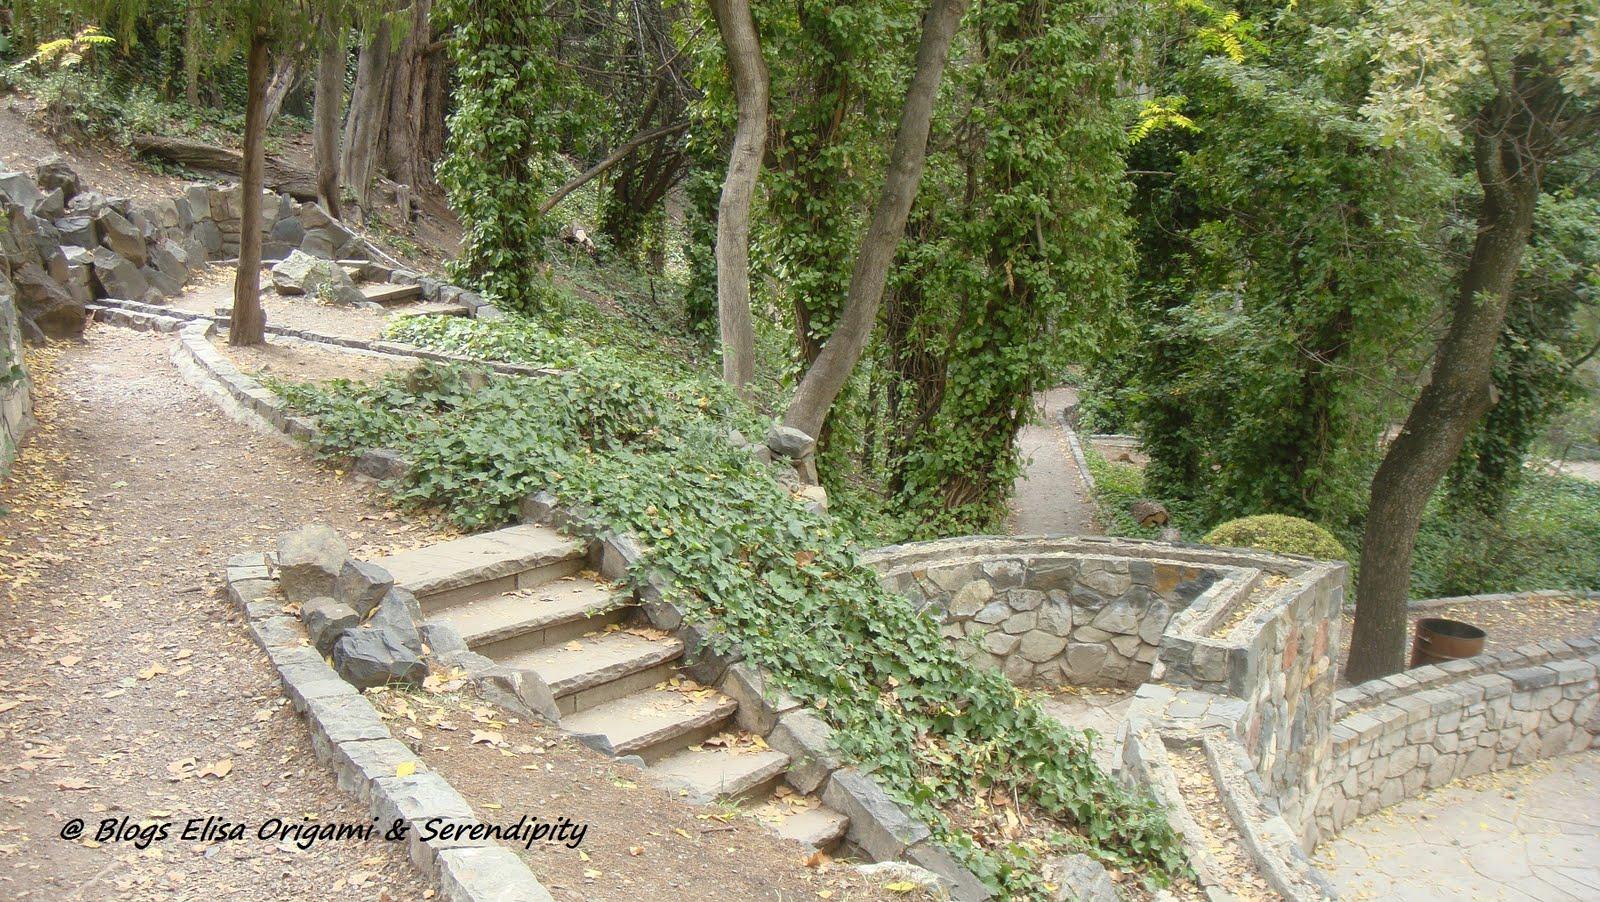 Reserva Natural de Villavicencio, Mendoza, Ruta del Vino, Argentina, Elisa N, Blog de Viajes, Lifestyle, Travel